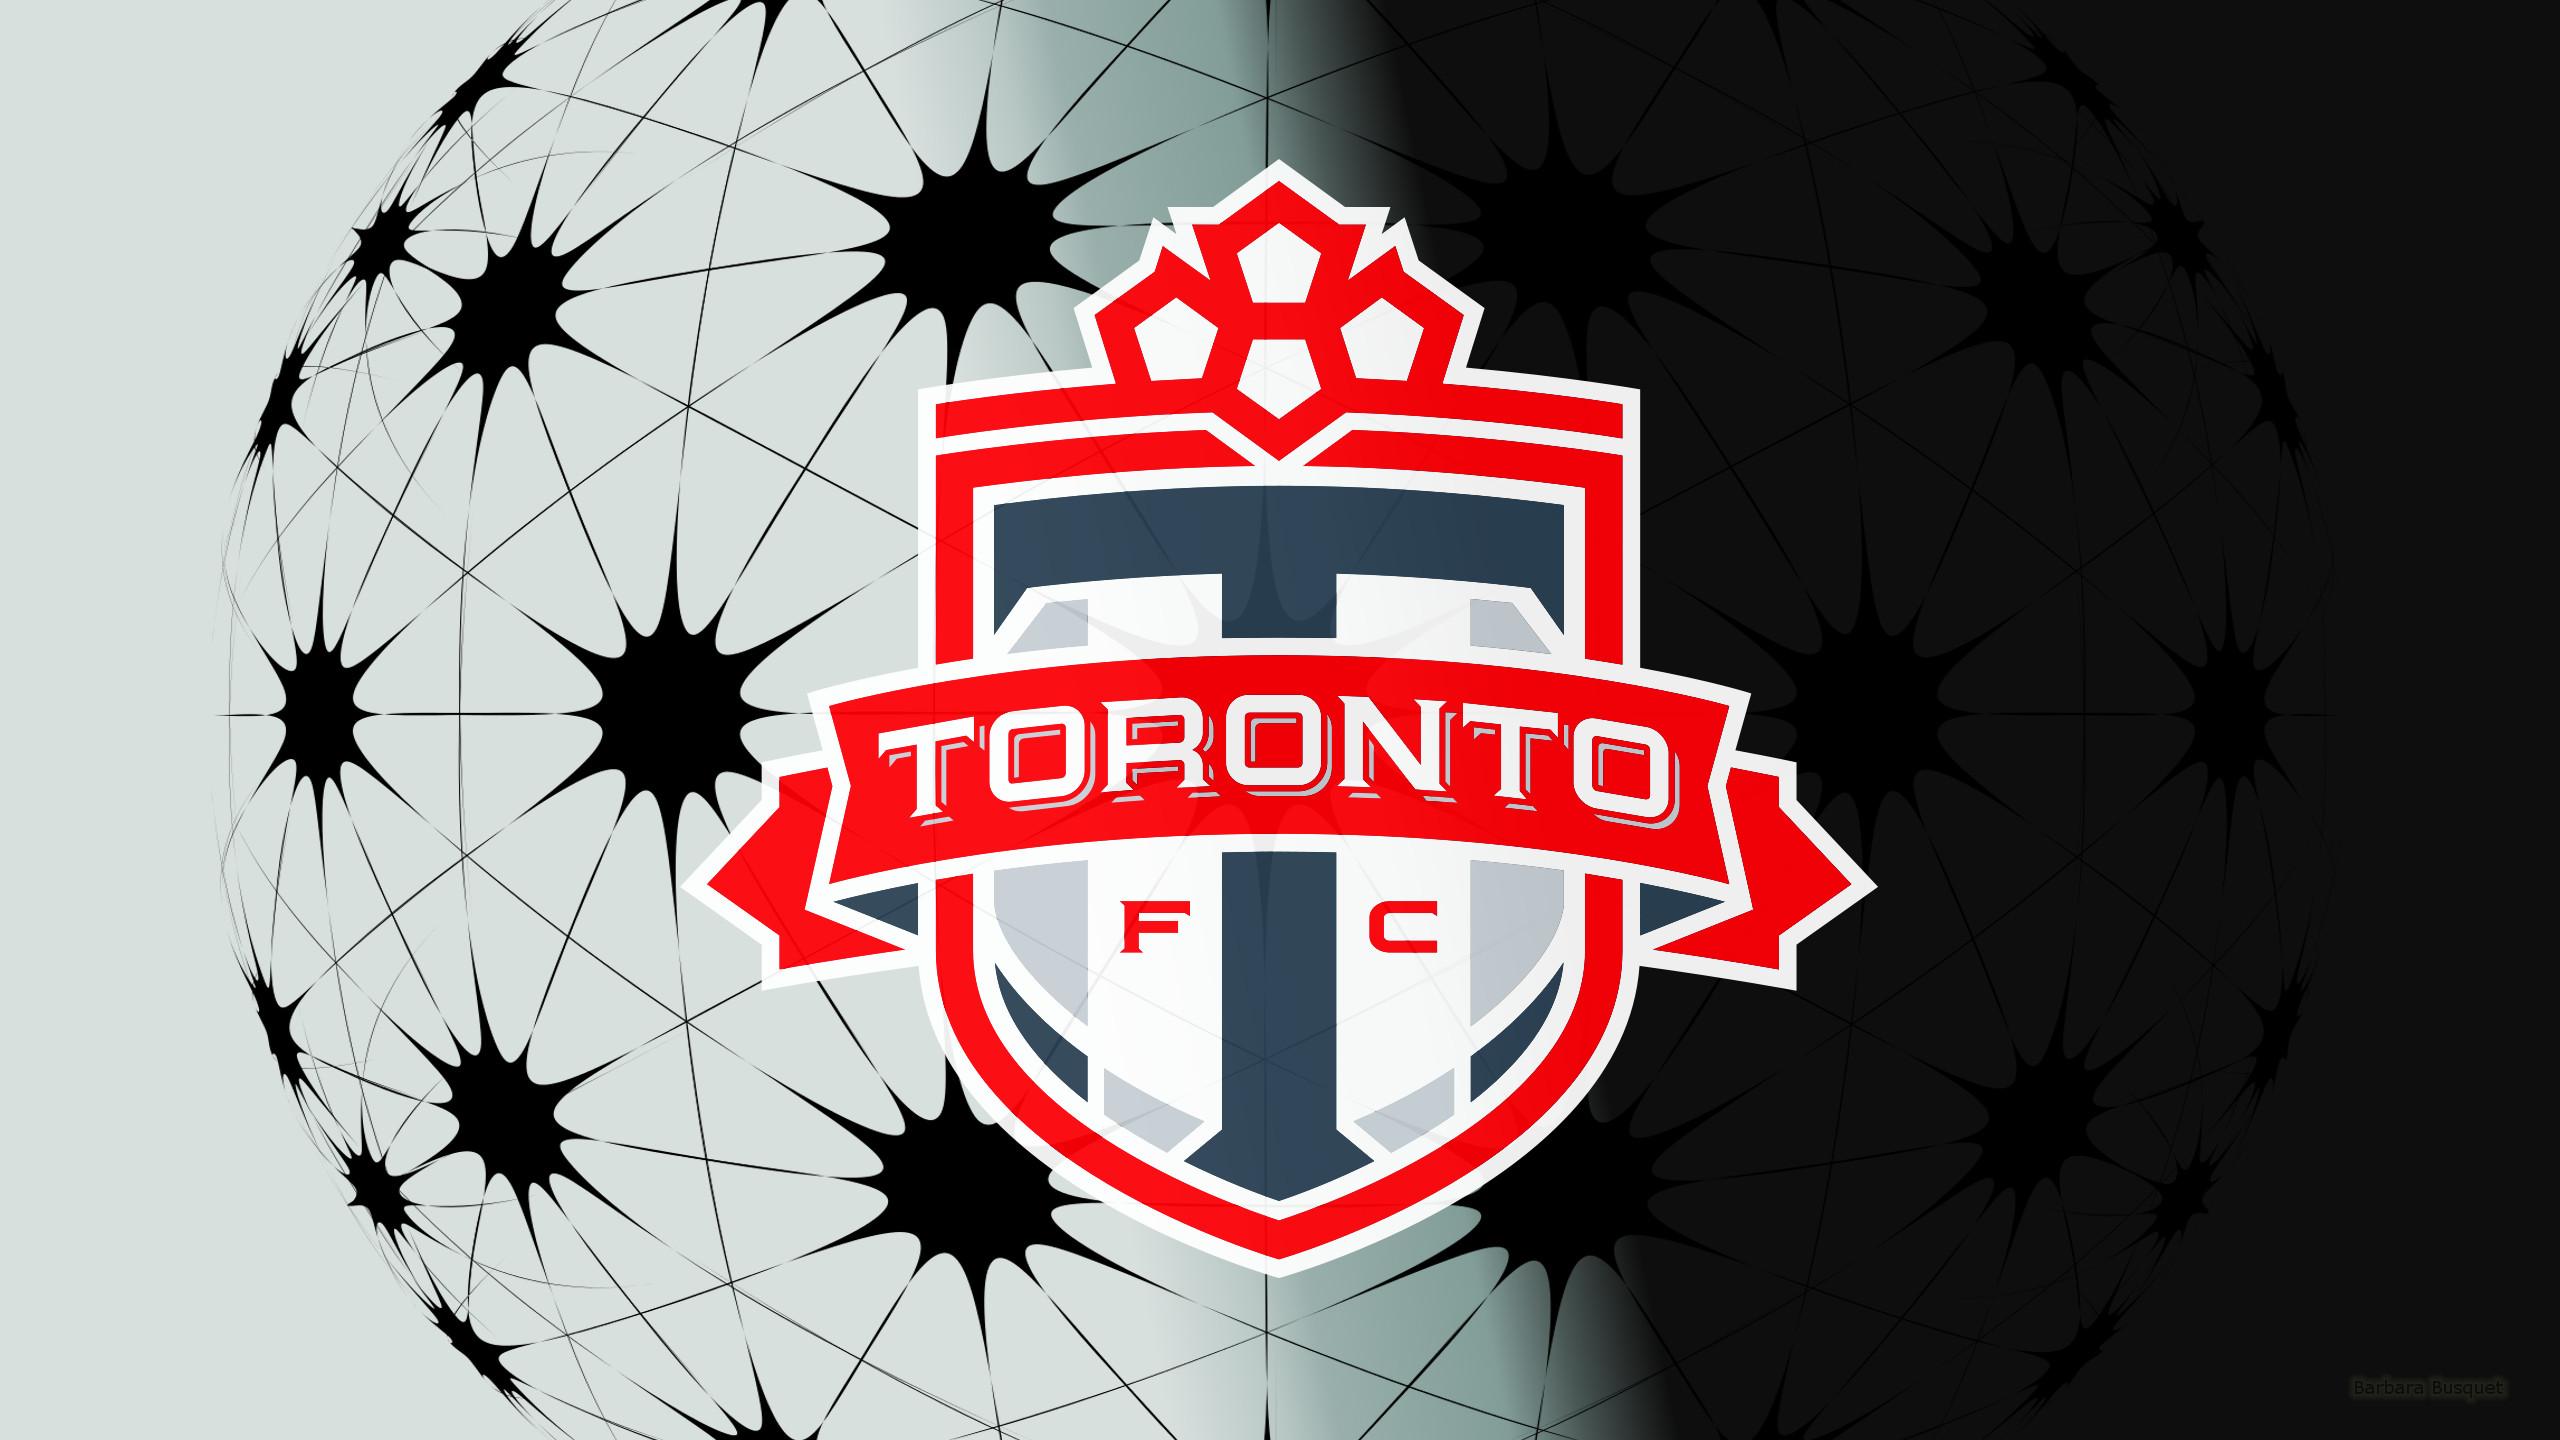 Toronto FC (TFC) logo wallpapers - Barbaras HD Wallpapers